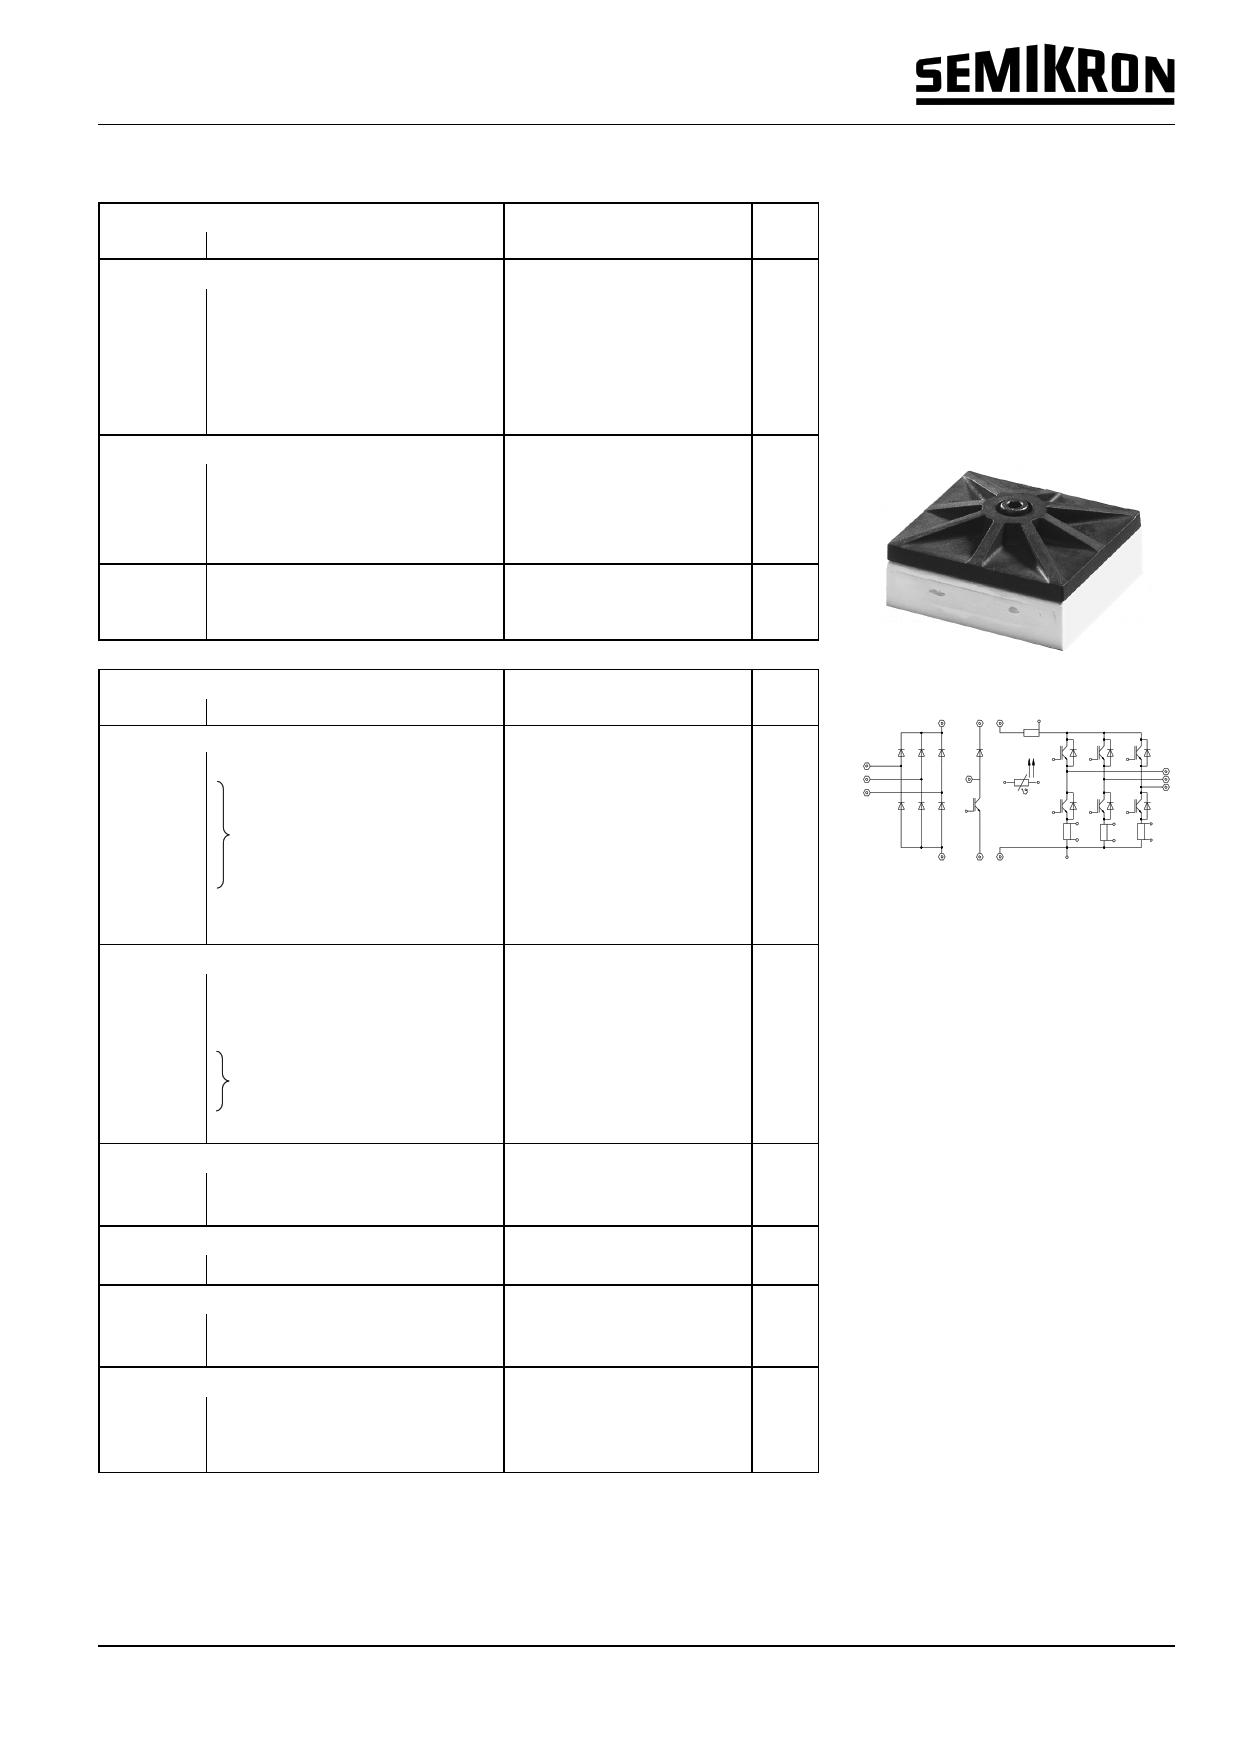 SKiiP22NAB12 데이터시트 및 SKiiP22NAB12 PDF